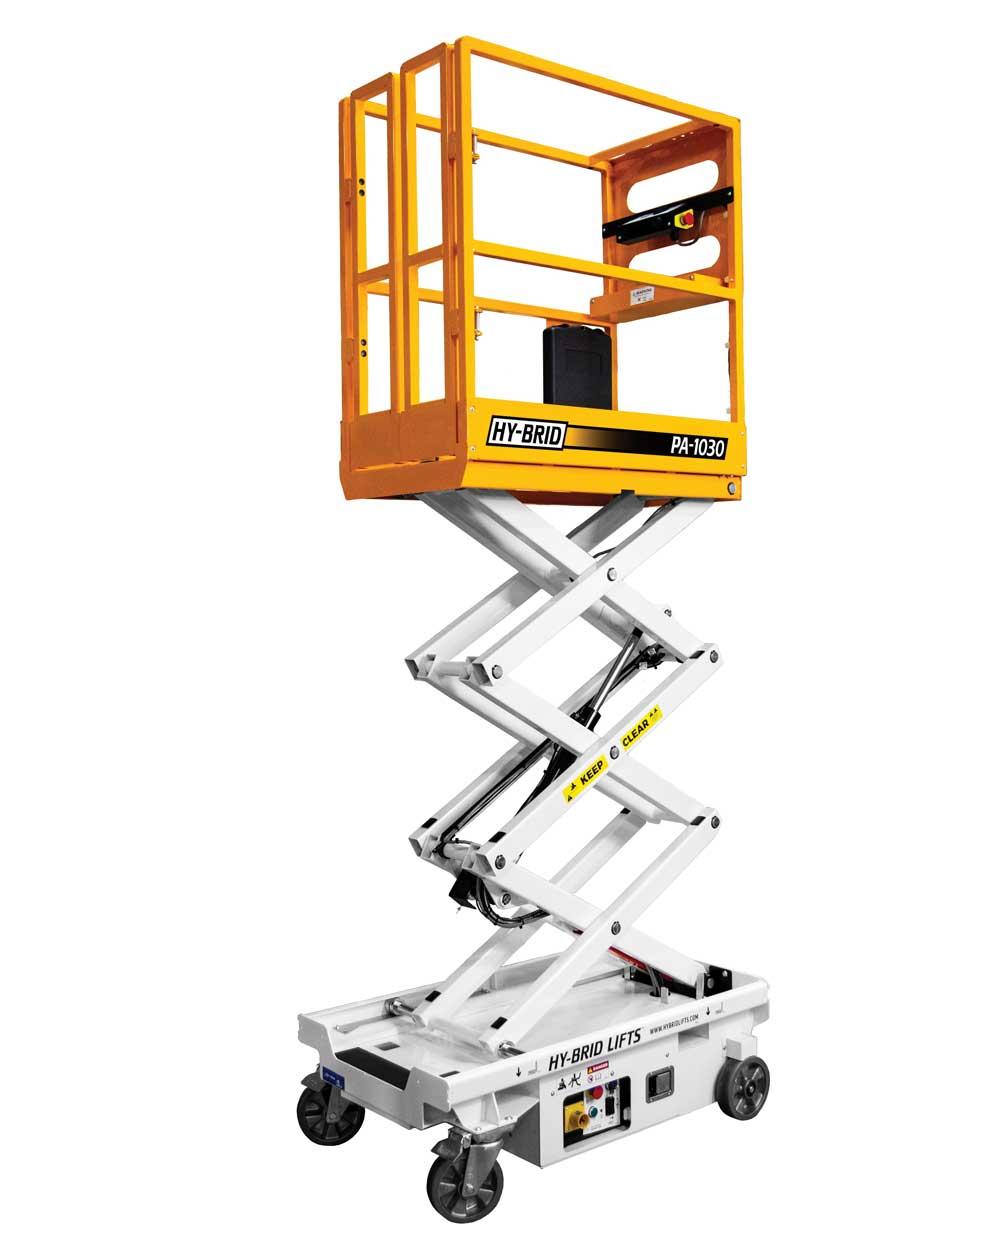 hy-brid lift by Custom Equipment